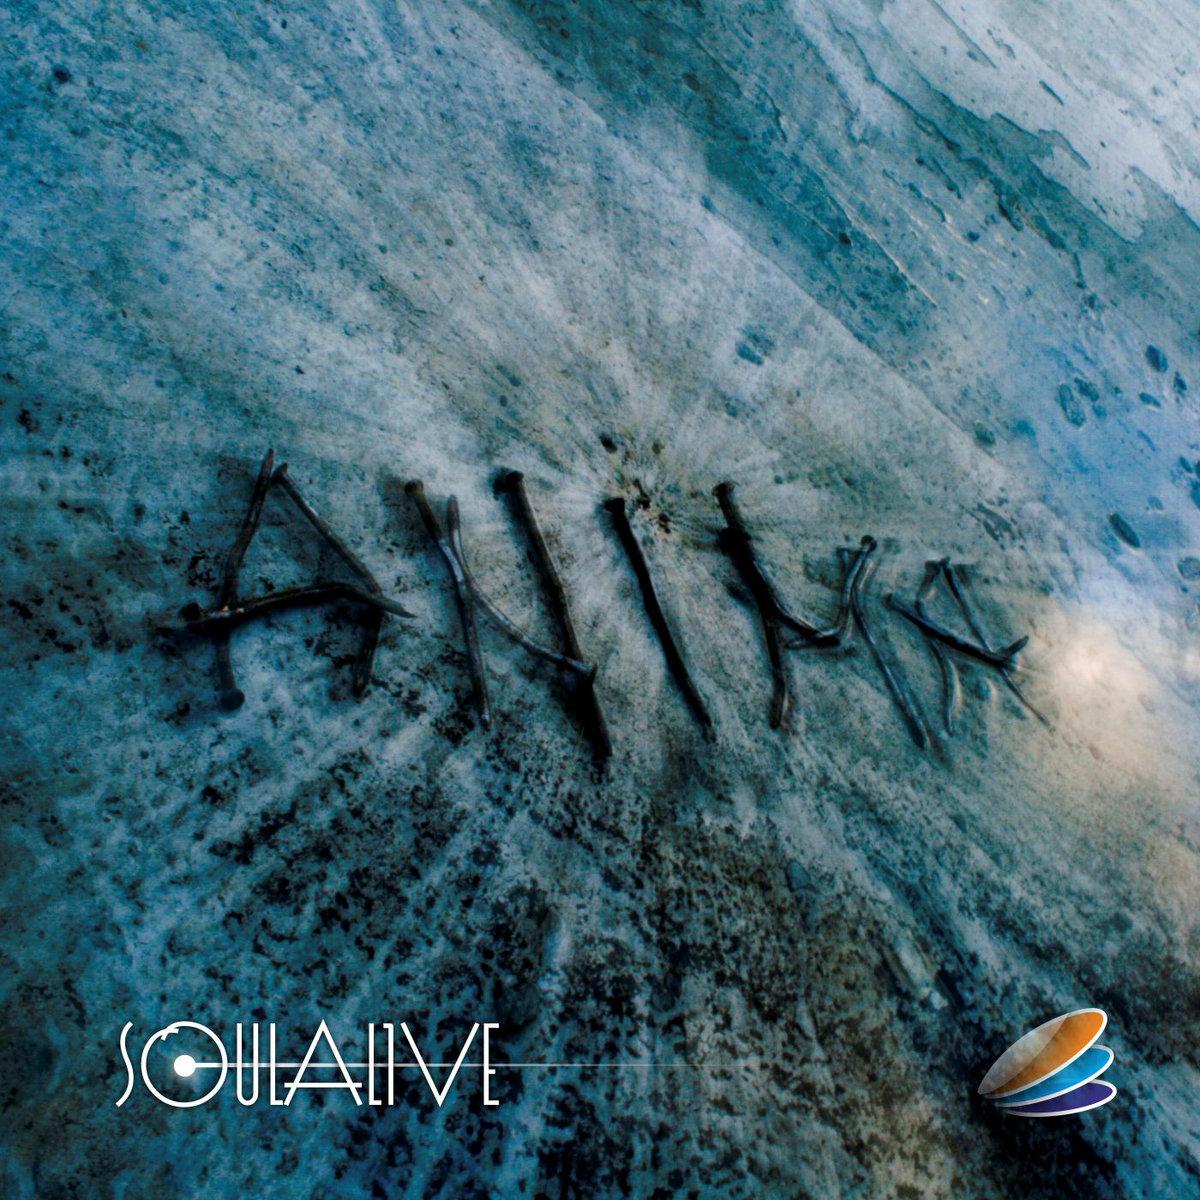 Soulalive - Anima